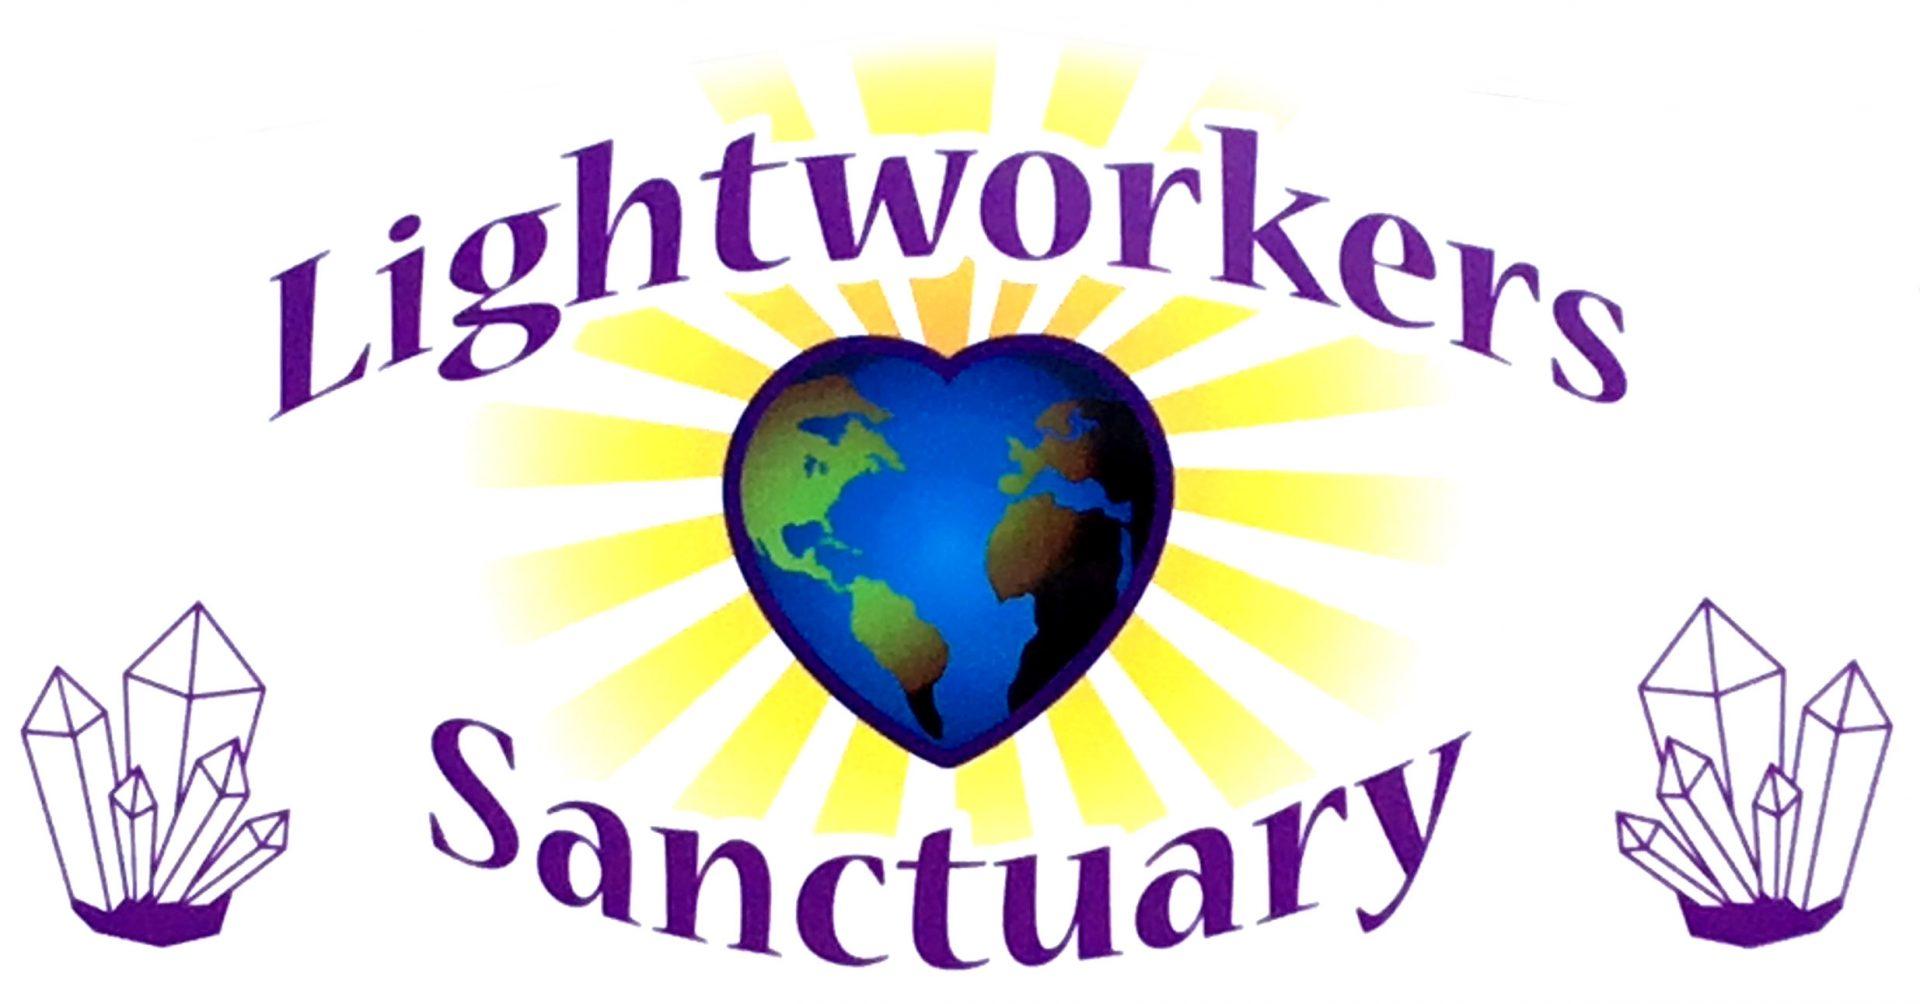 Lightworkers Sanctuary Has Taken Precautions During The Coronavirus Shutdown And Is Now Open